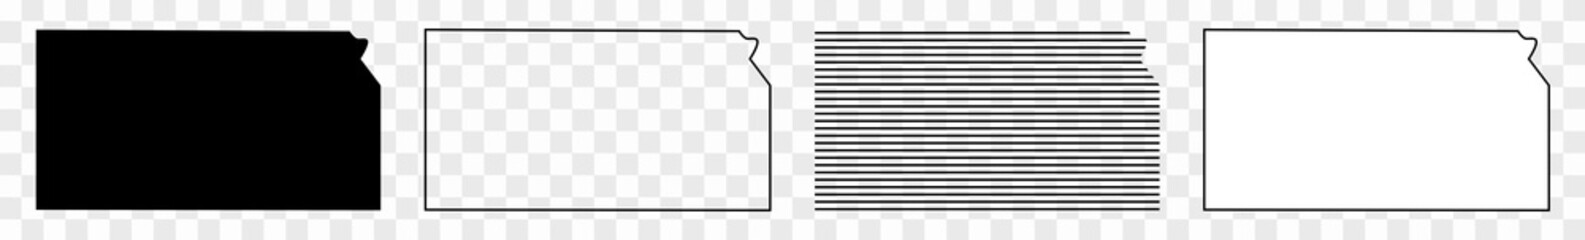 Kansas Map Black | State Border | United States | US America | Transparent Isolated | Variations